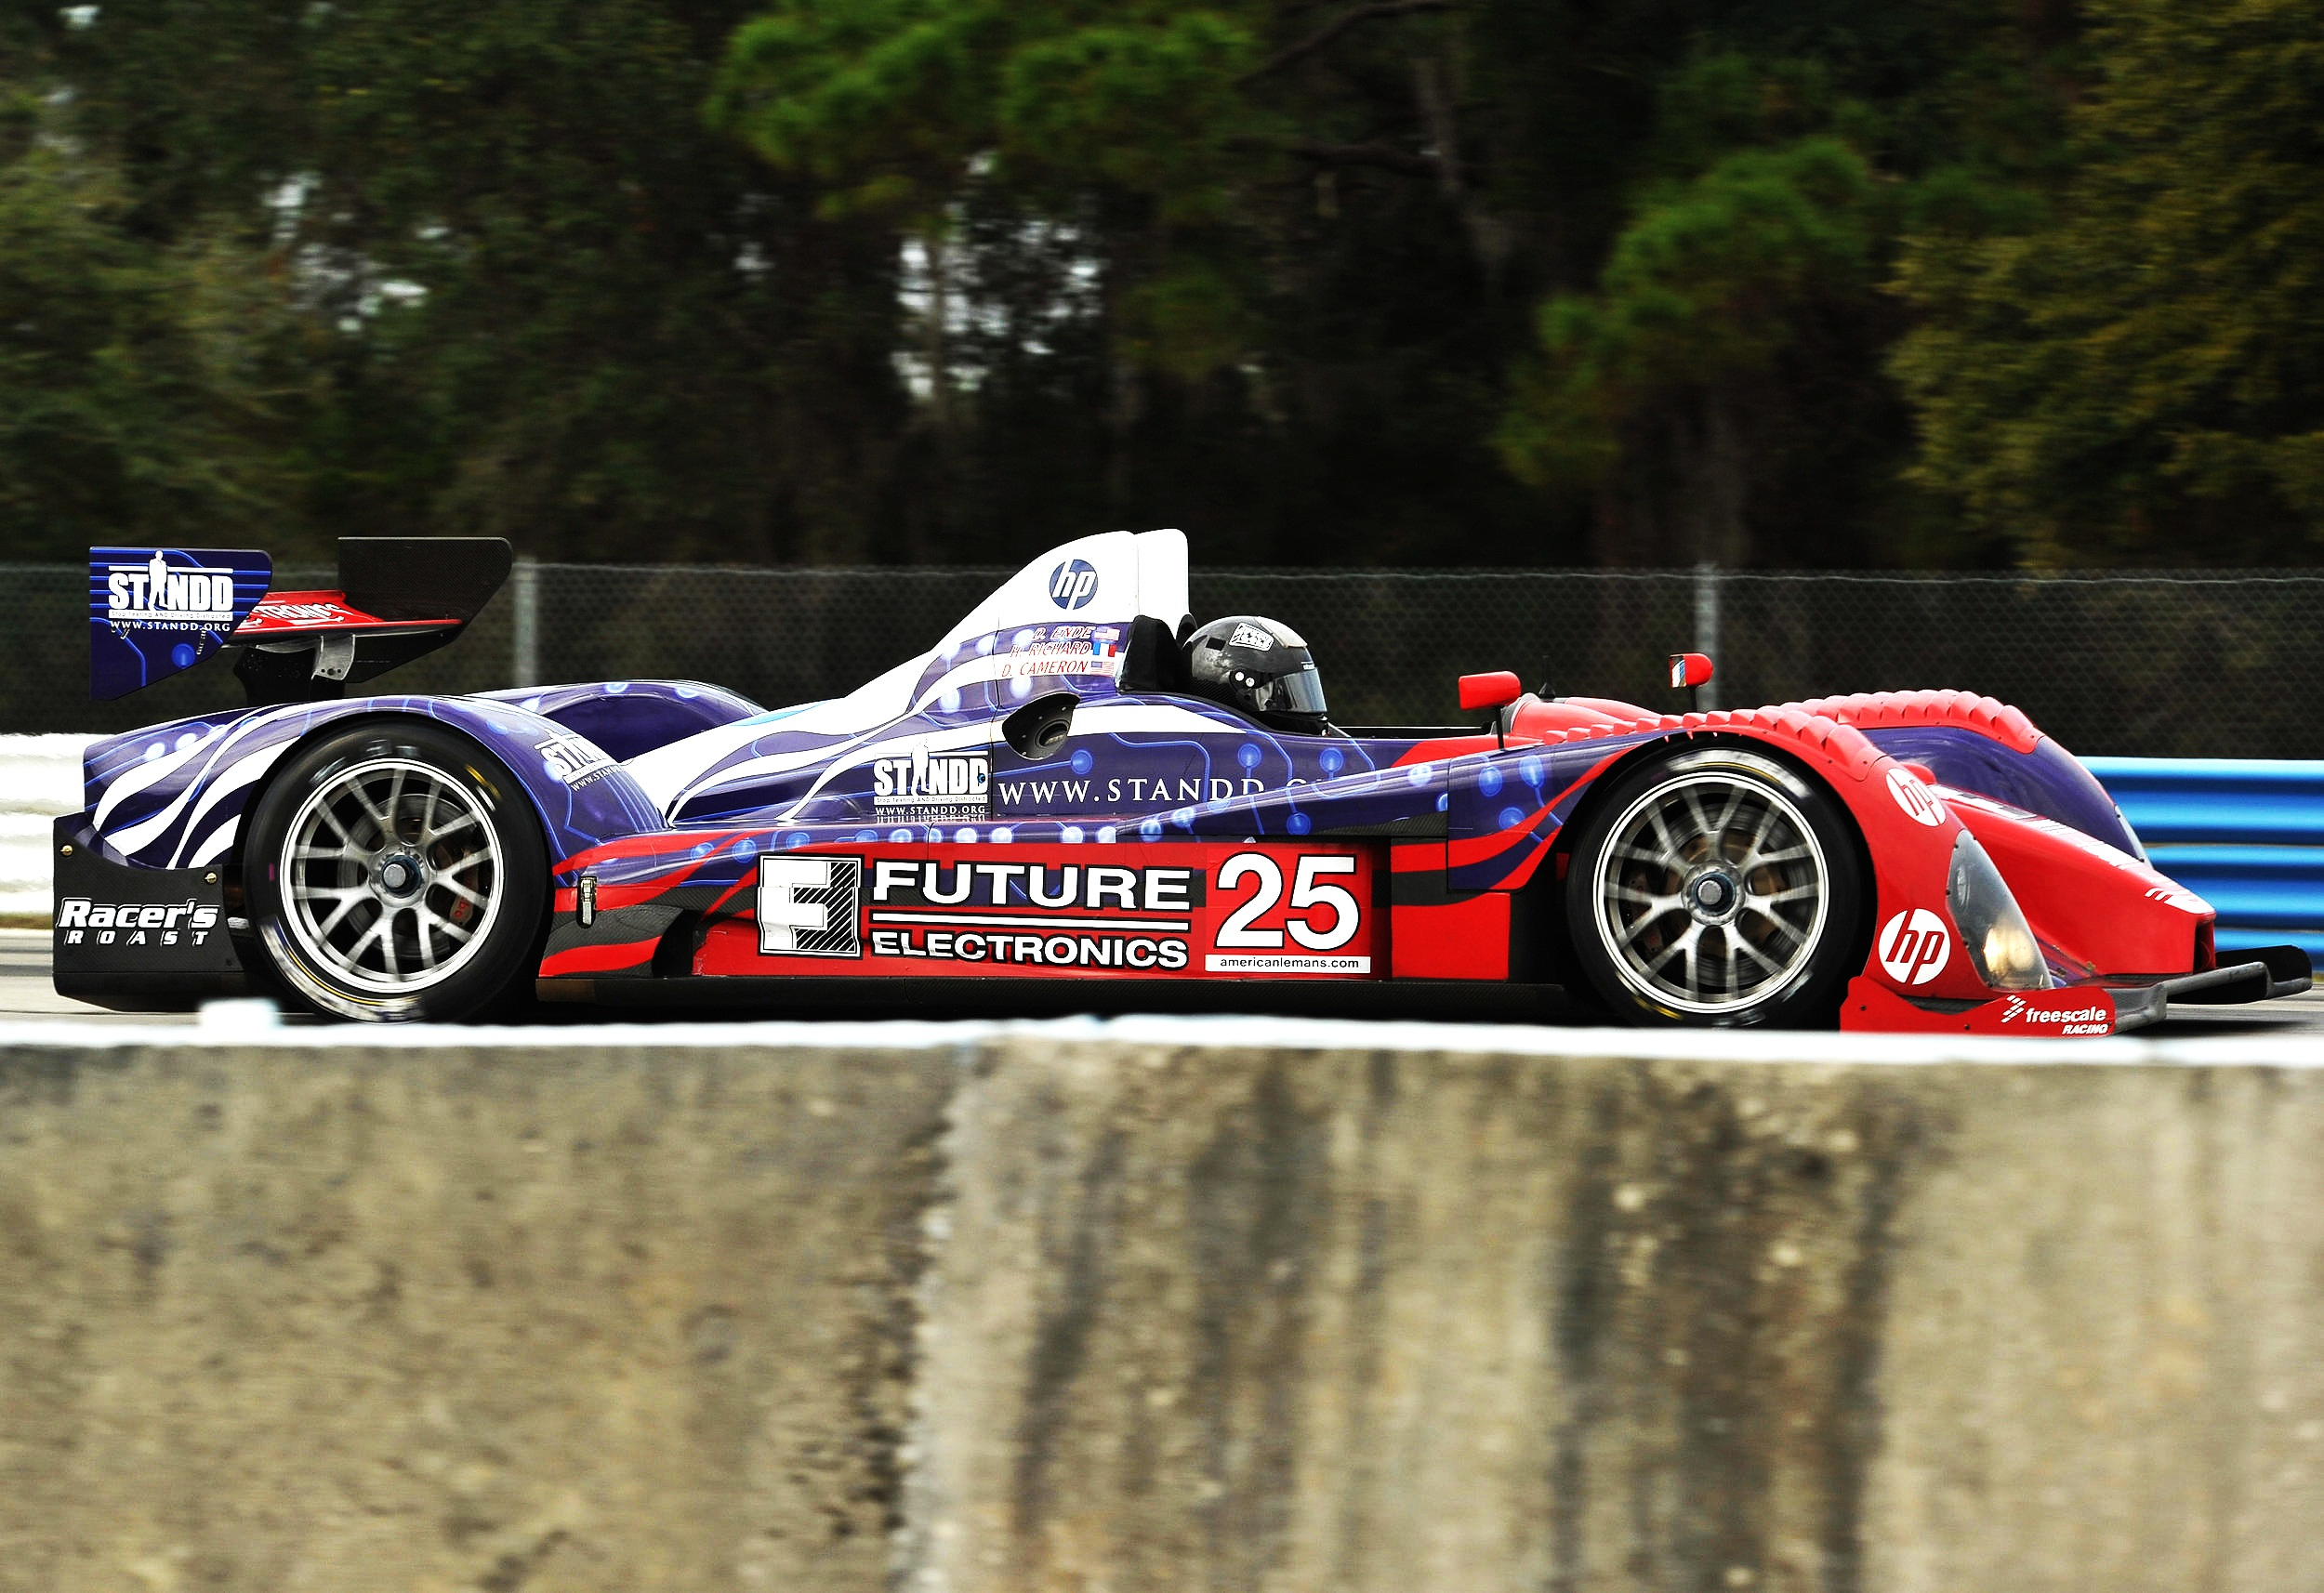 The Art of Racing -